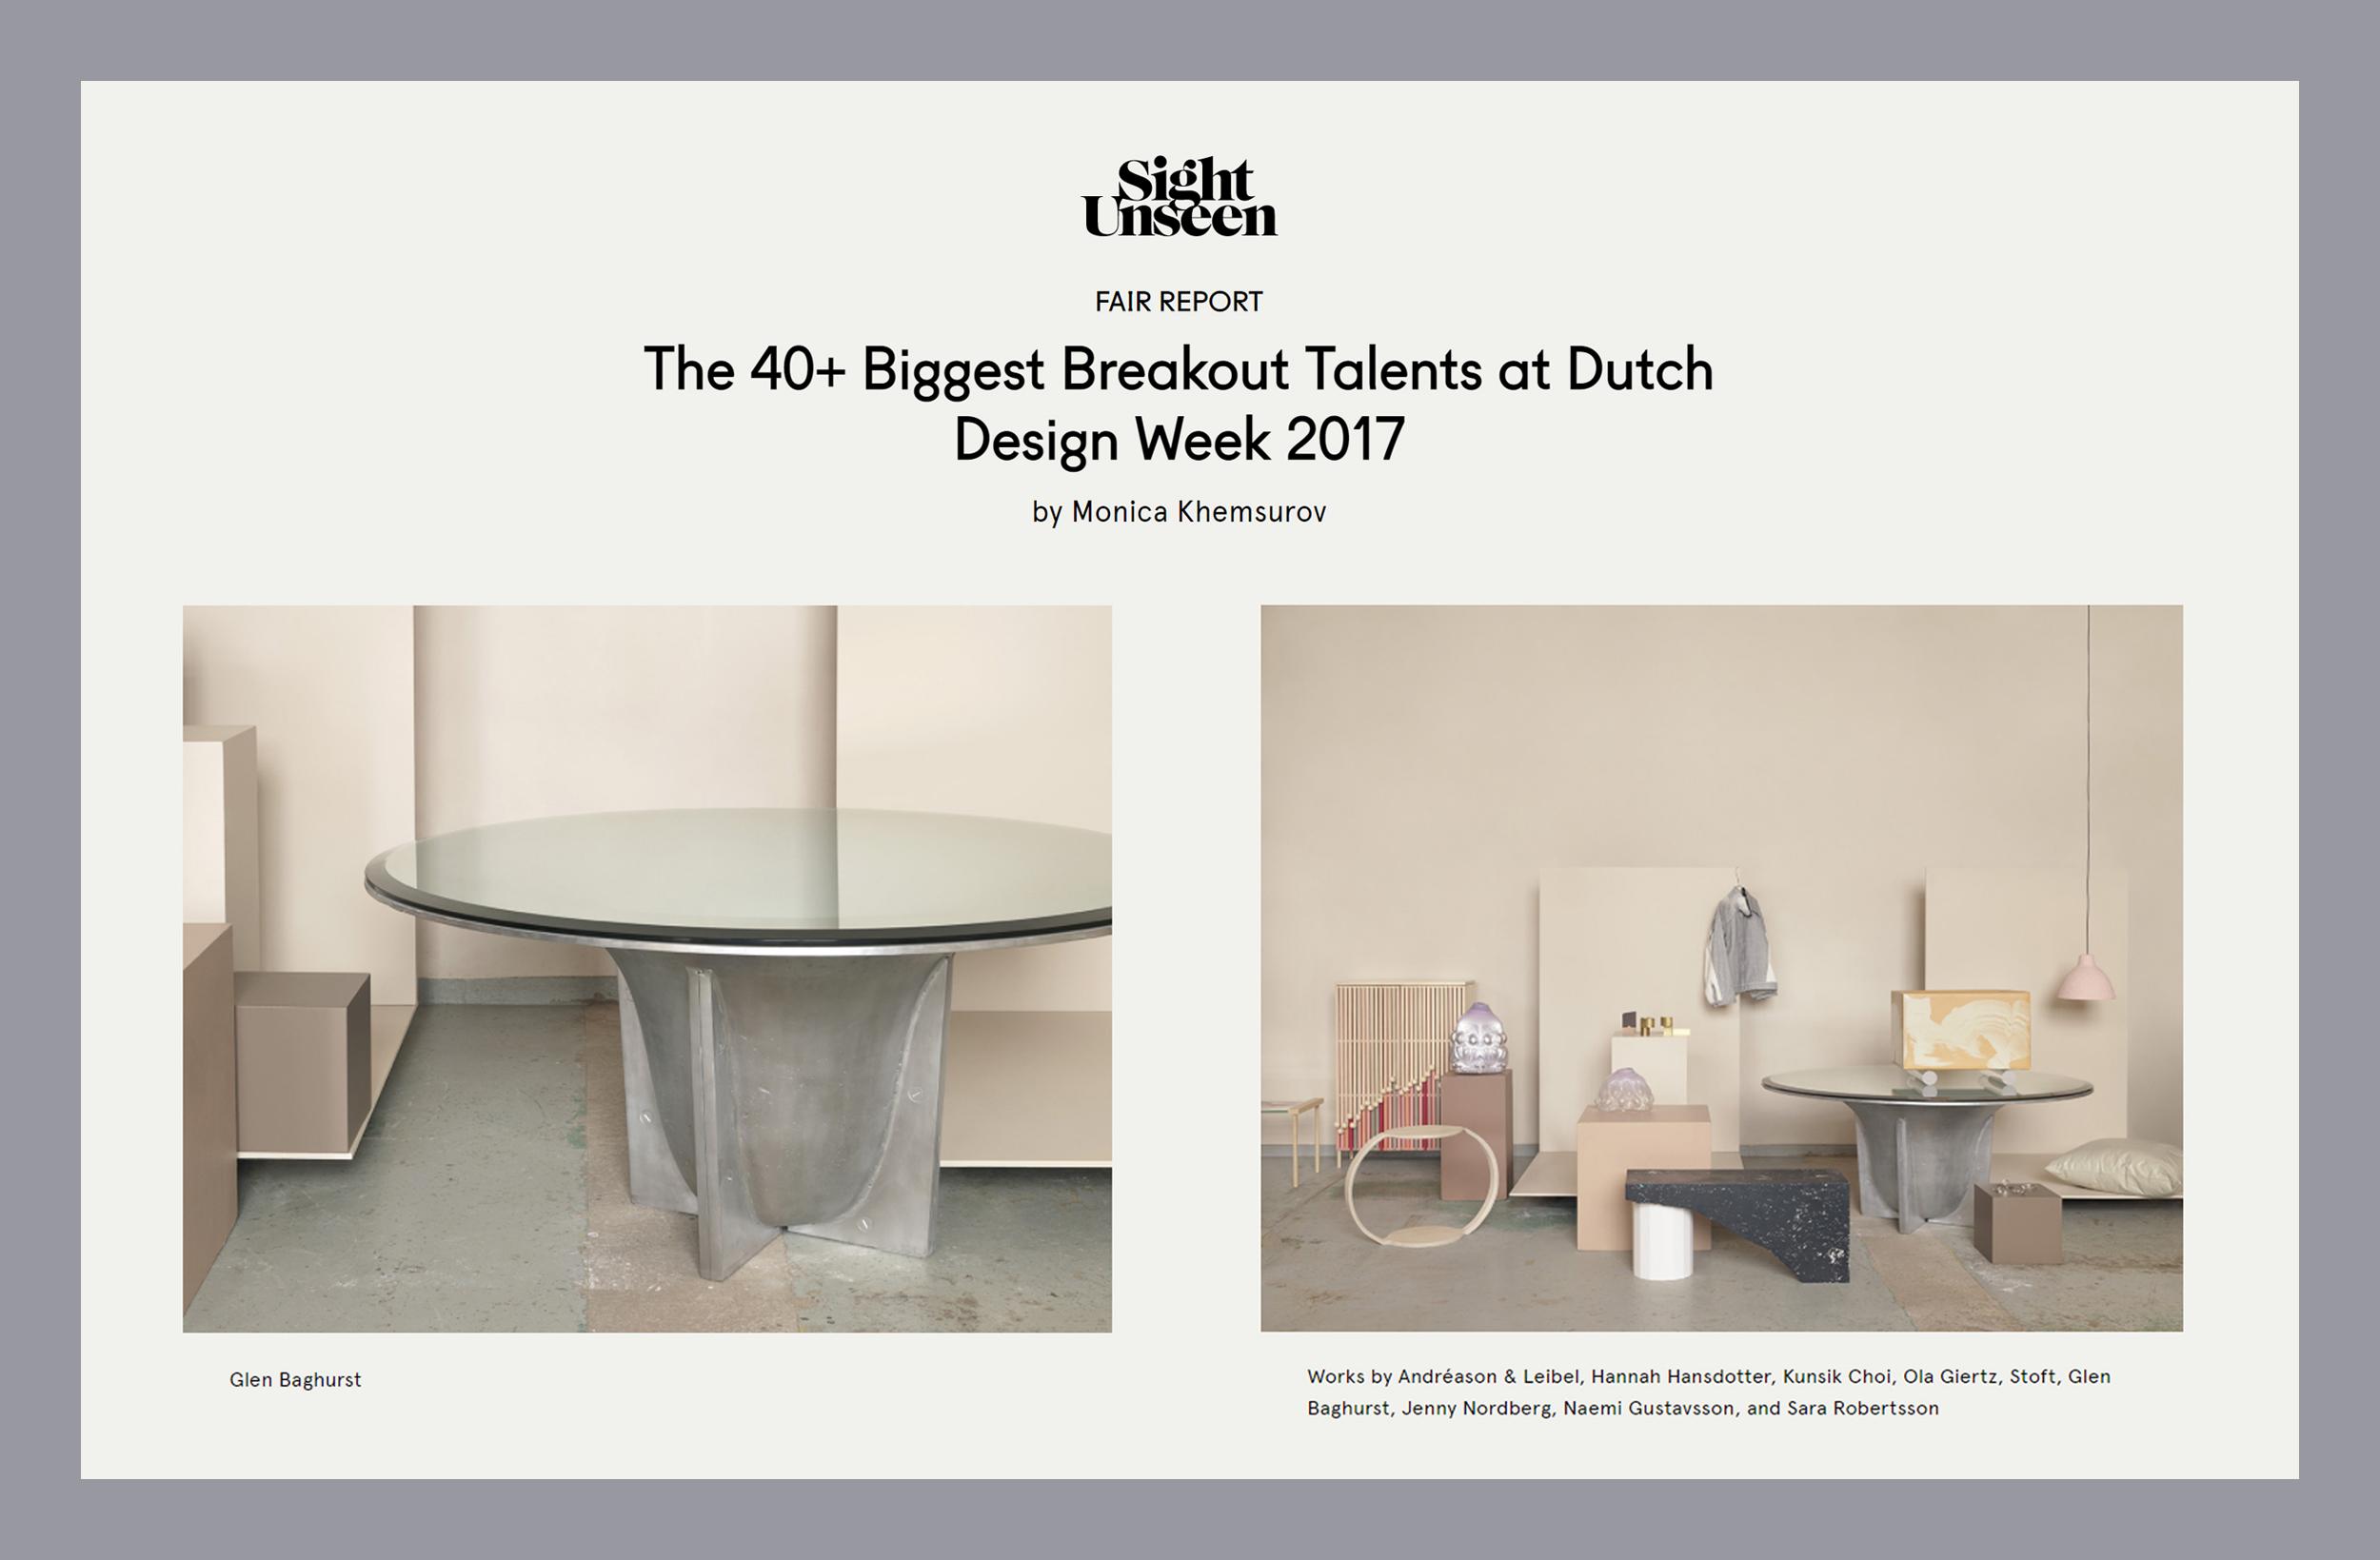 Sight Unseen Biggest Breakout Talents at Dutch Design Week 2017